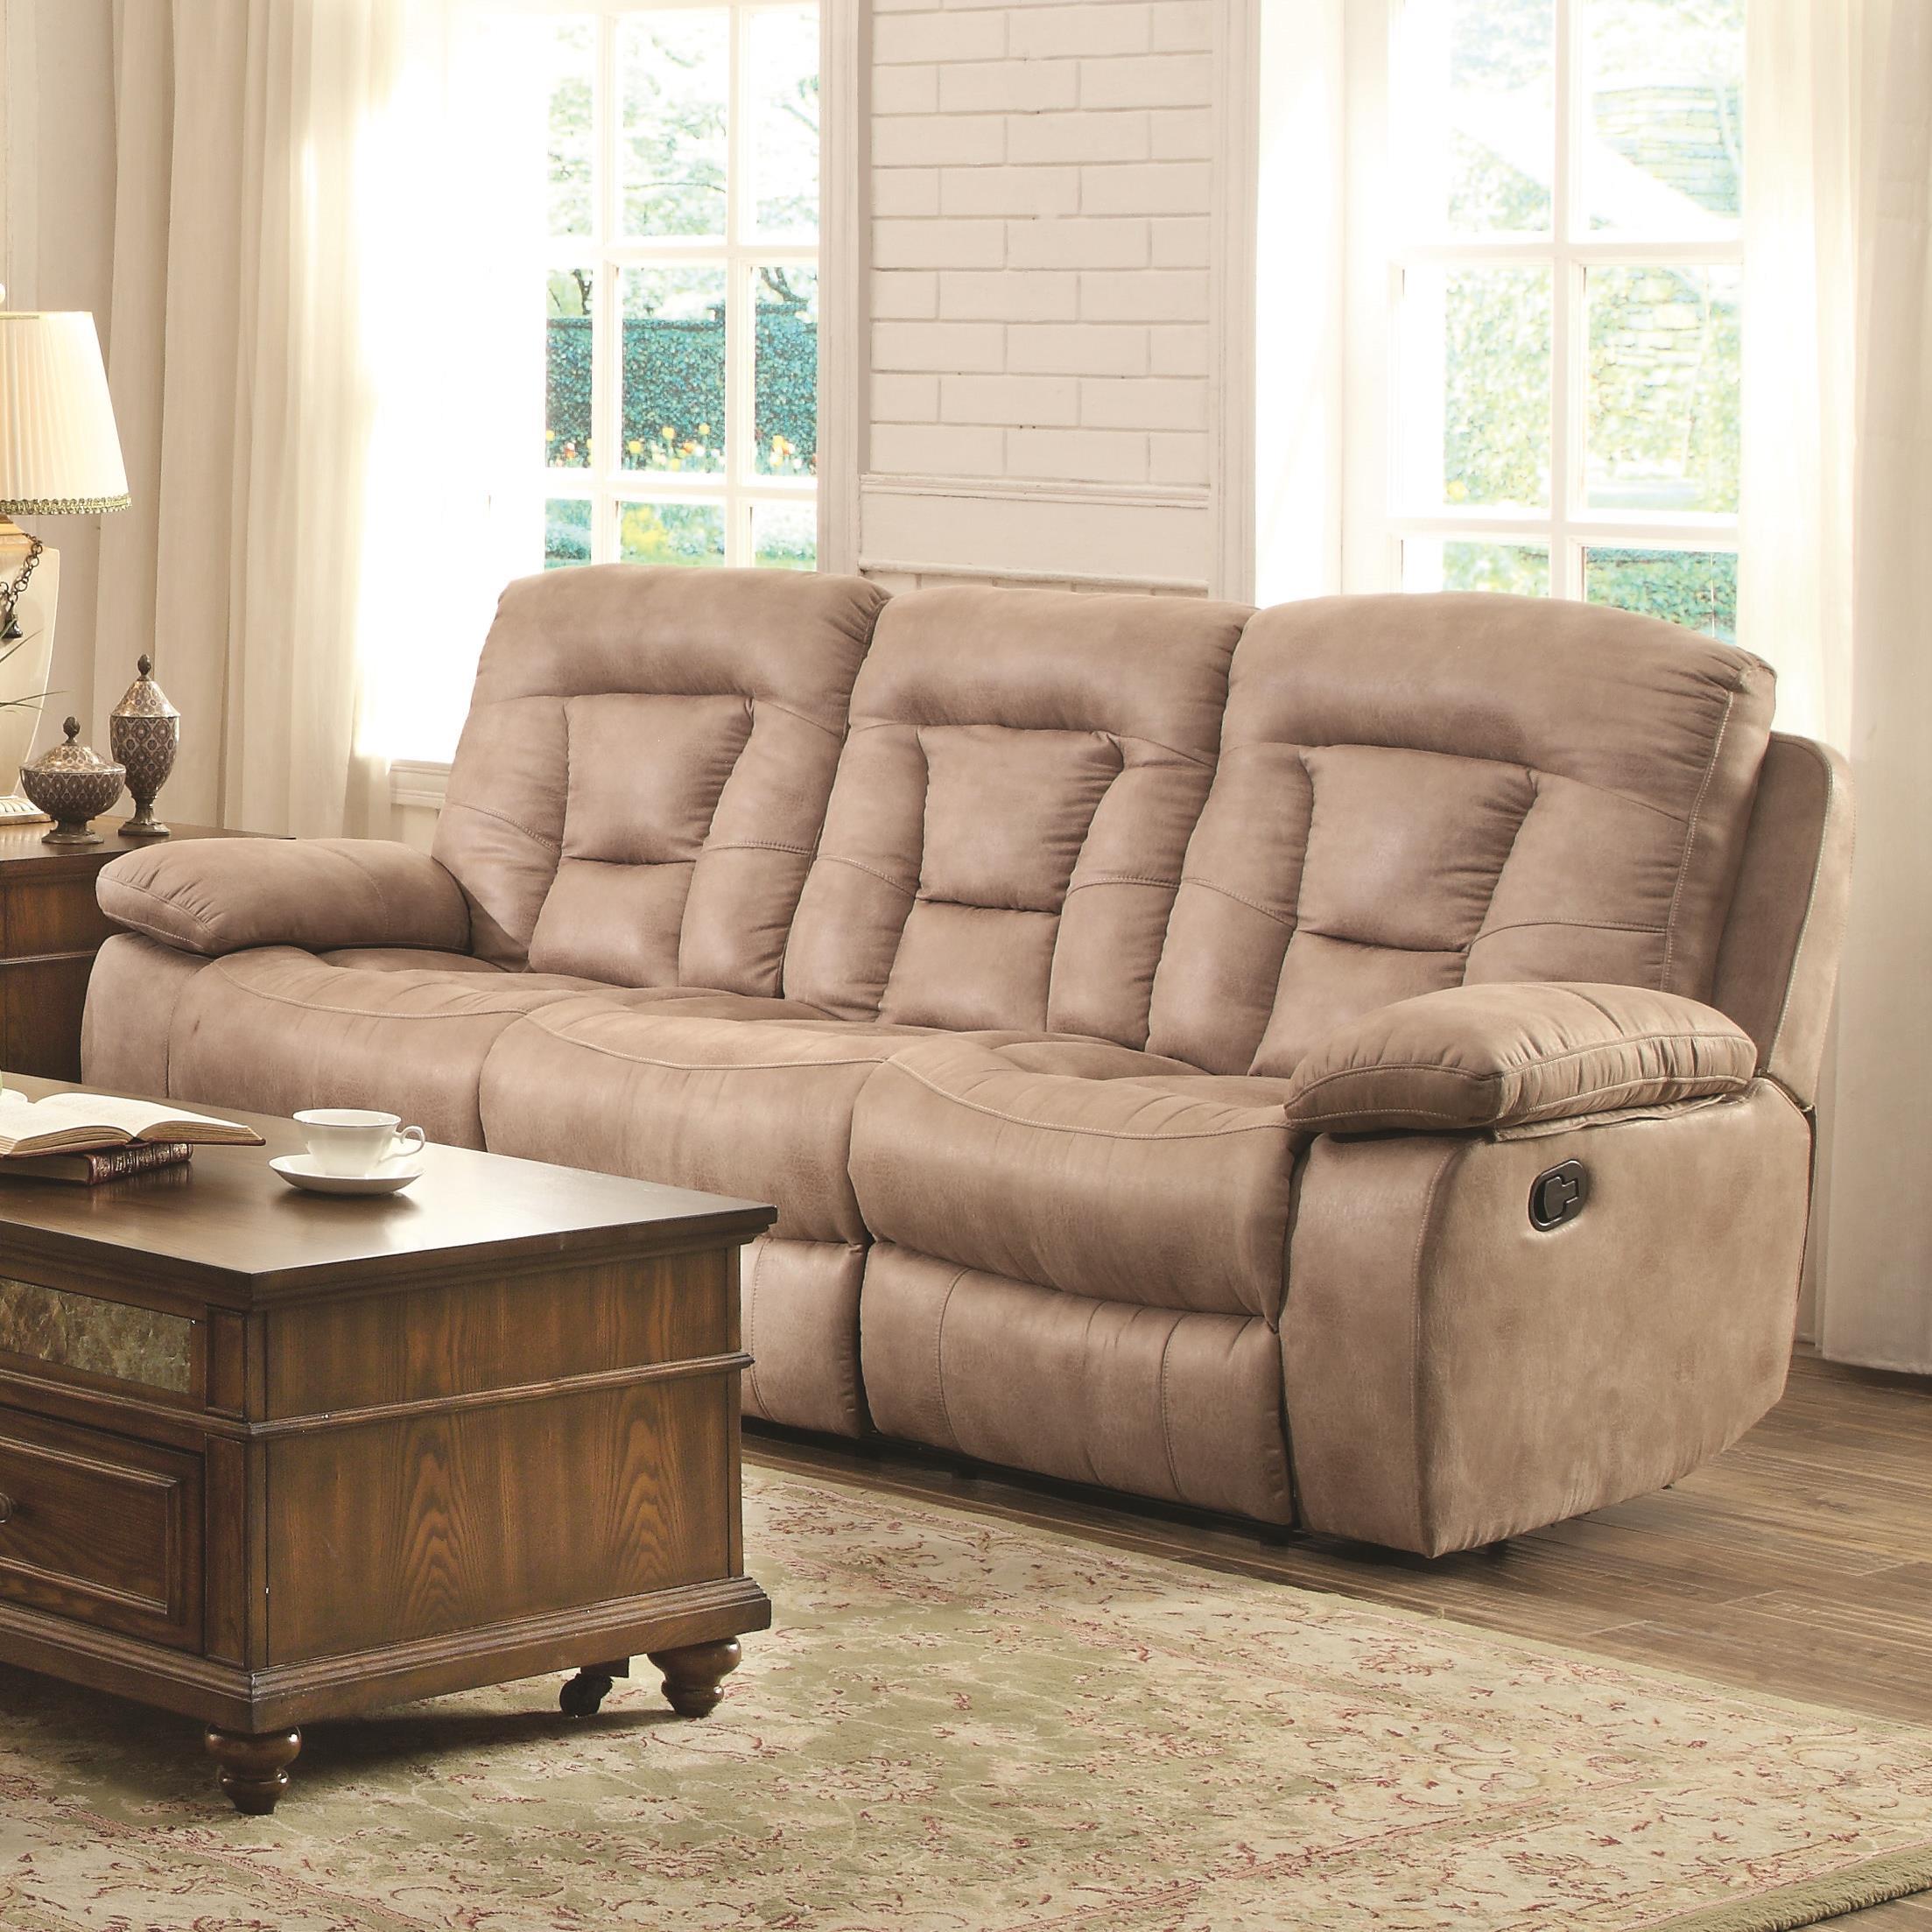 Coaster Evensky Motion Sofa - Item Number: 601861